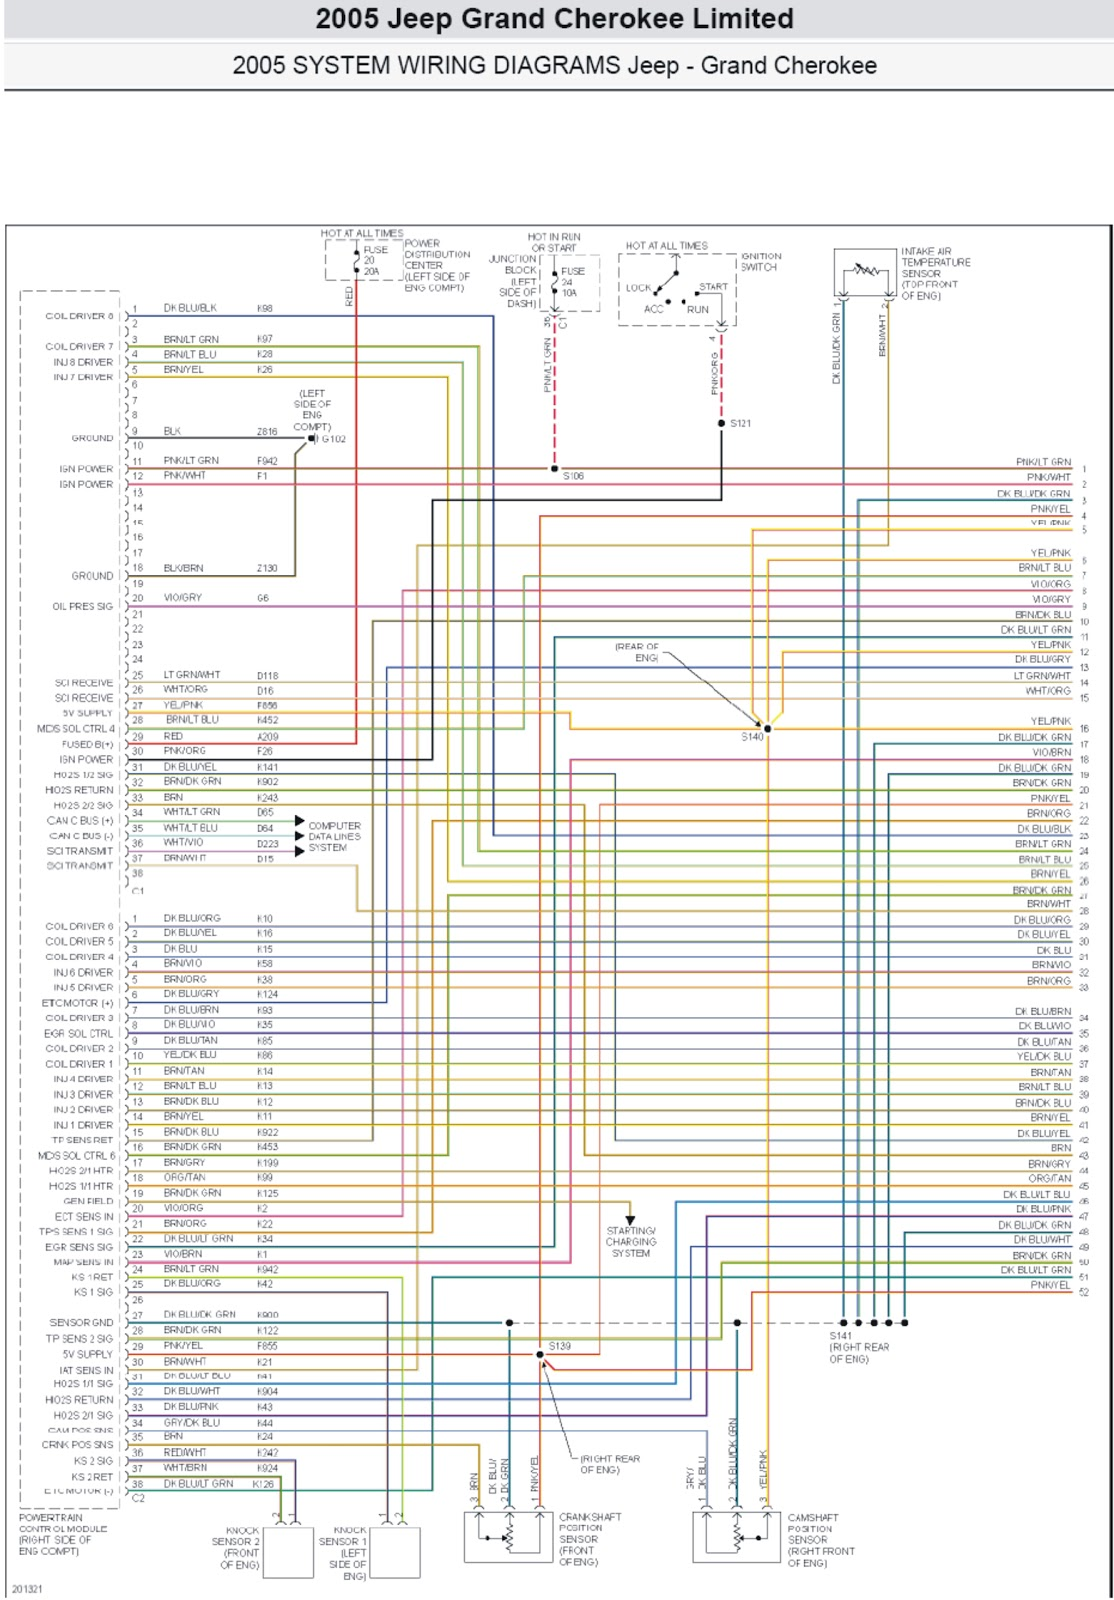 medium resolution of 2005 grand cherokee wiring diagram wiring diagrams wni jeep grand cherokee wiring diagram 2014 jeep grand cherokee wiring